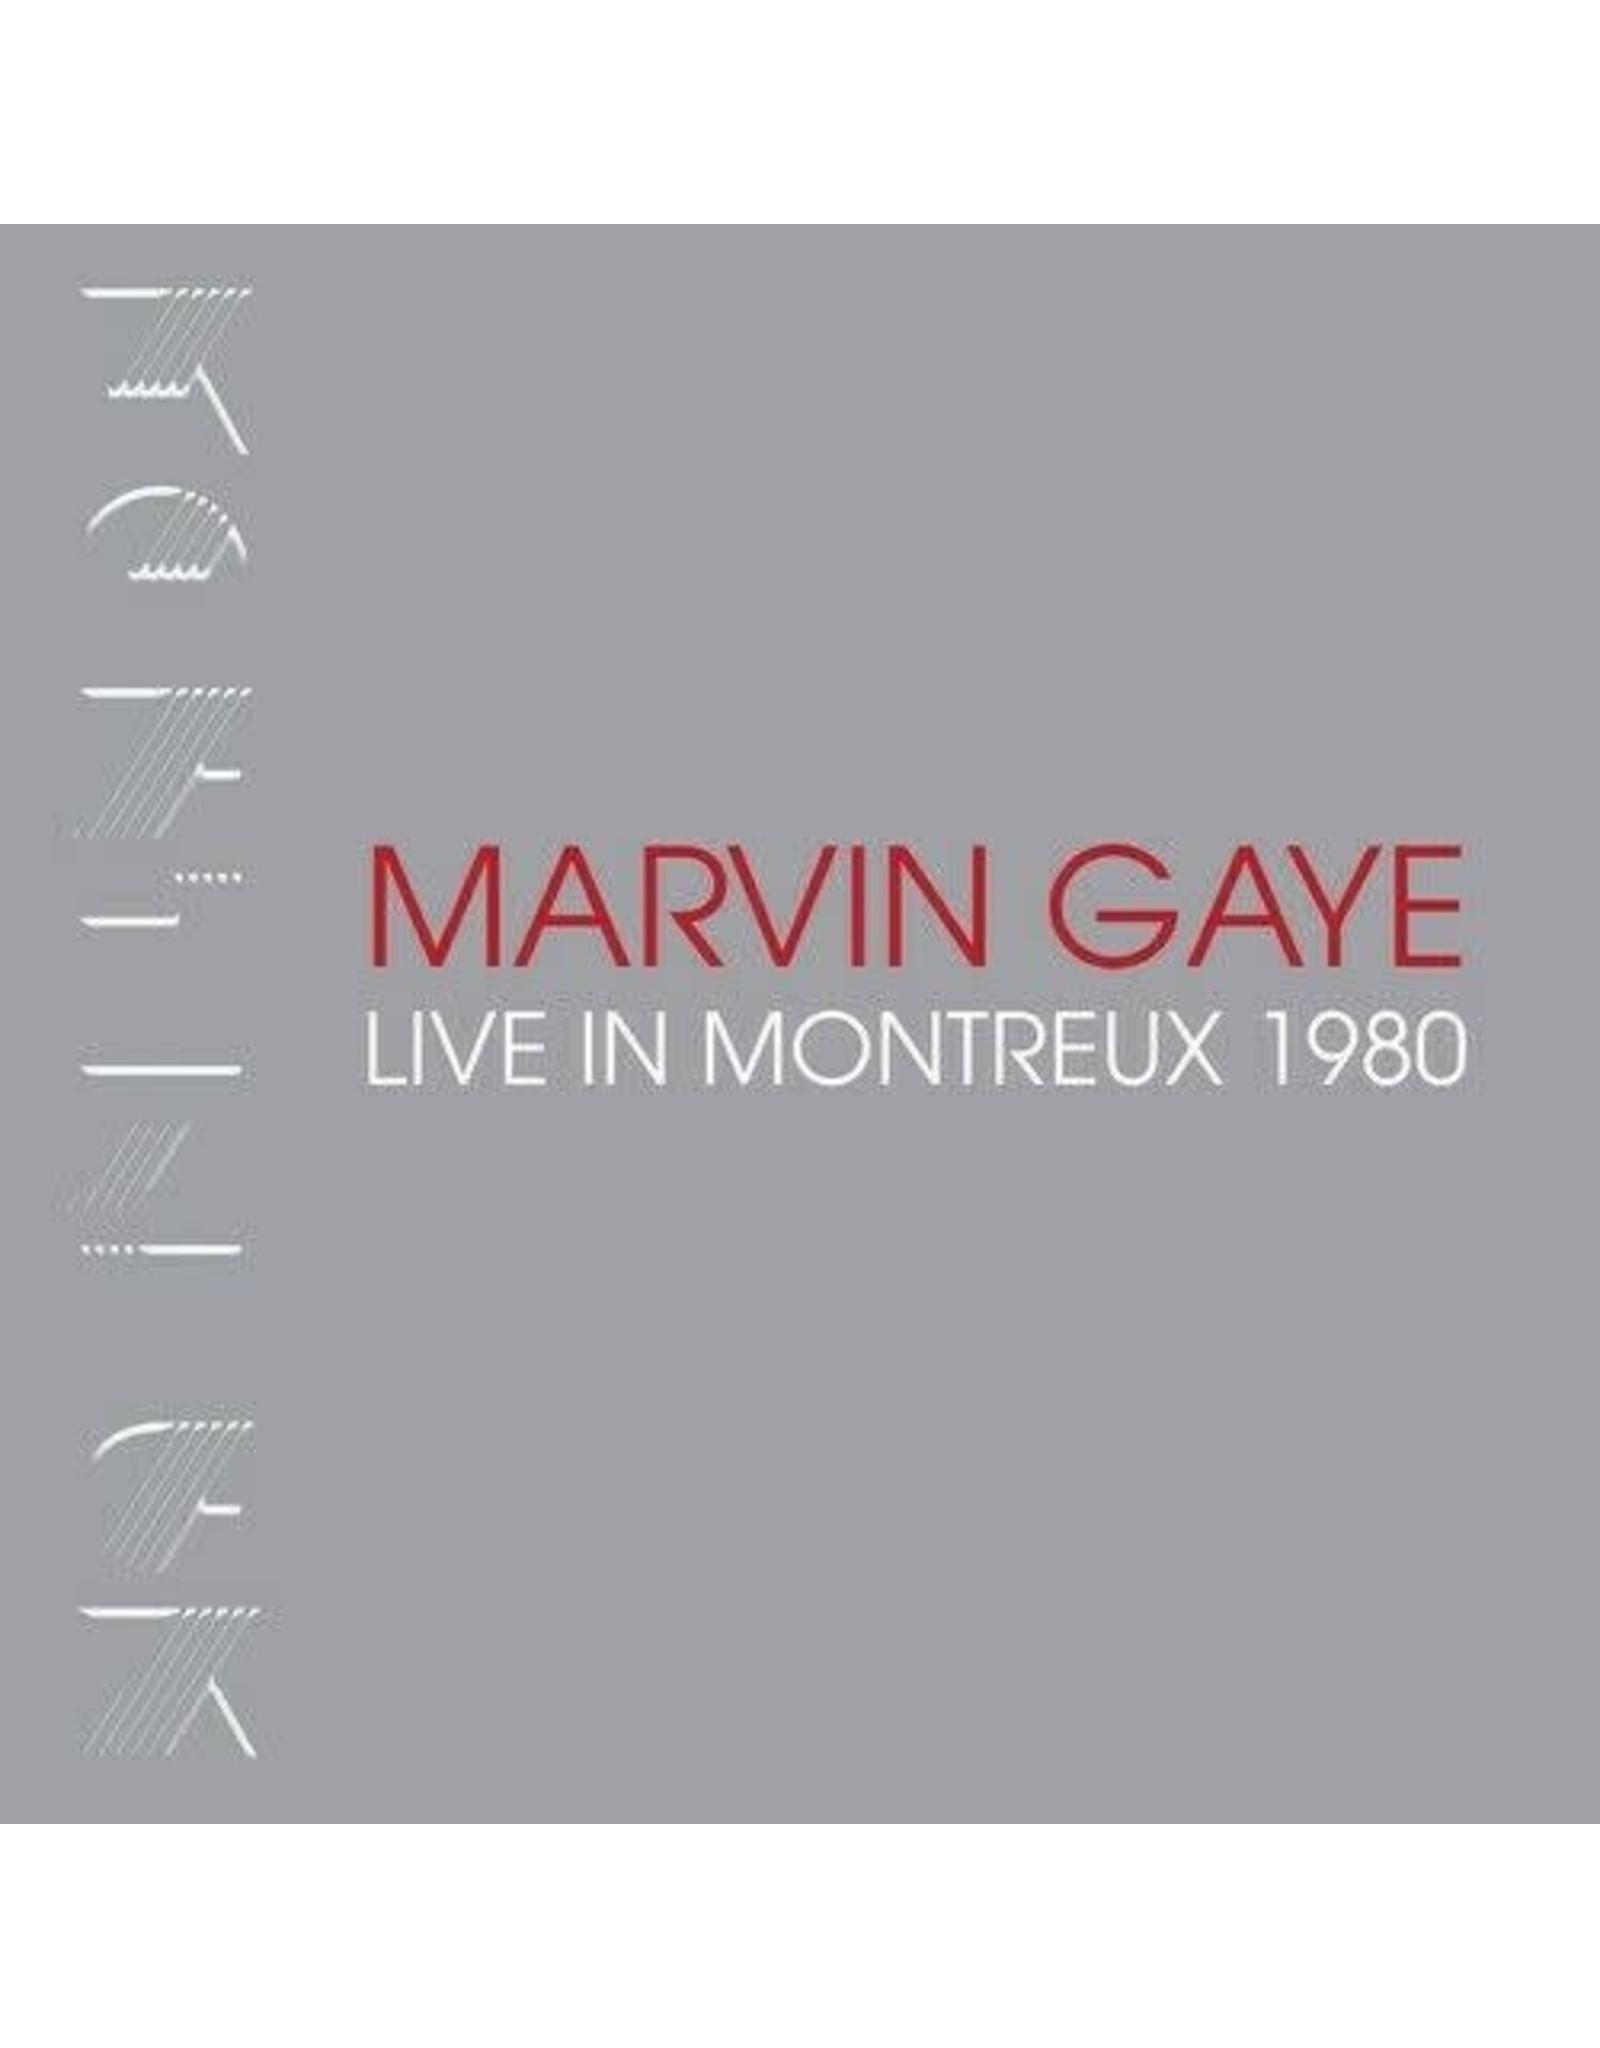 Gaye, Marvin - Live In Montreux 1980 2 LP & 2 CD